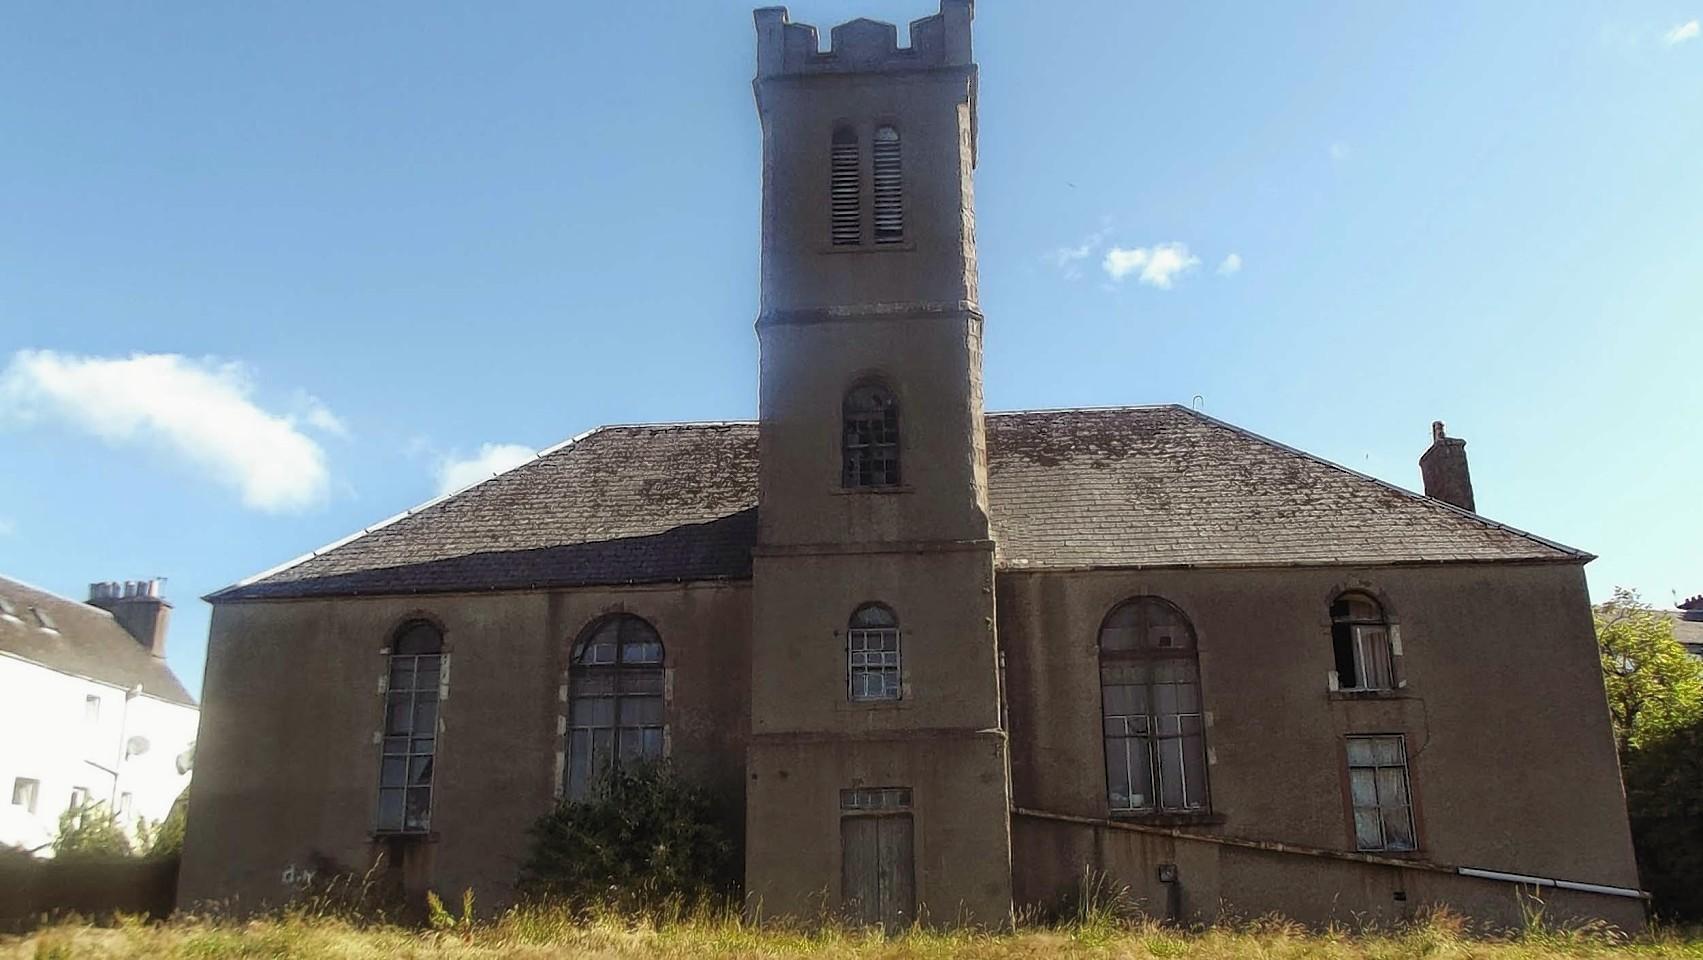 St Michael's Old Parish Church in Crieff